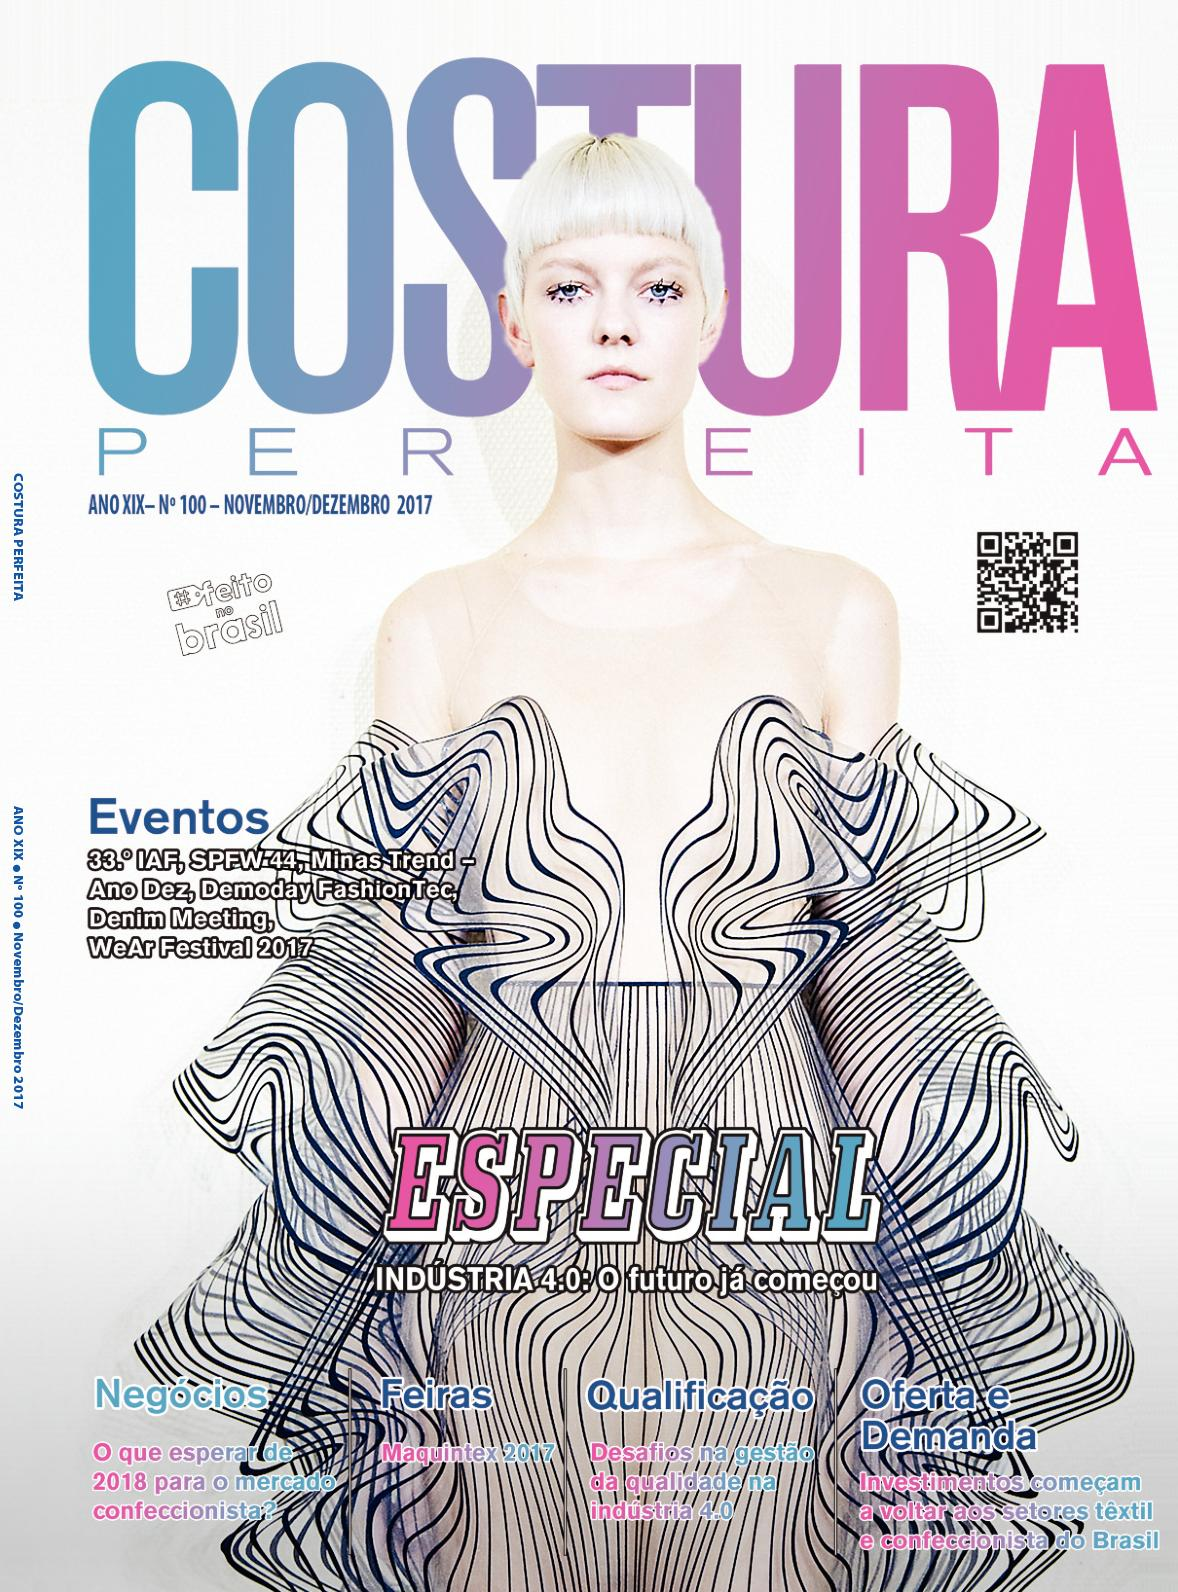 187803cf2f3 Calaméo - Revista Costura Perfeita Edição Ano XIX - N100 - Novembro -  Dezembro 2017